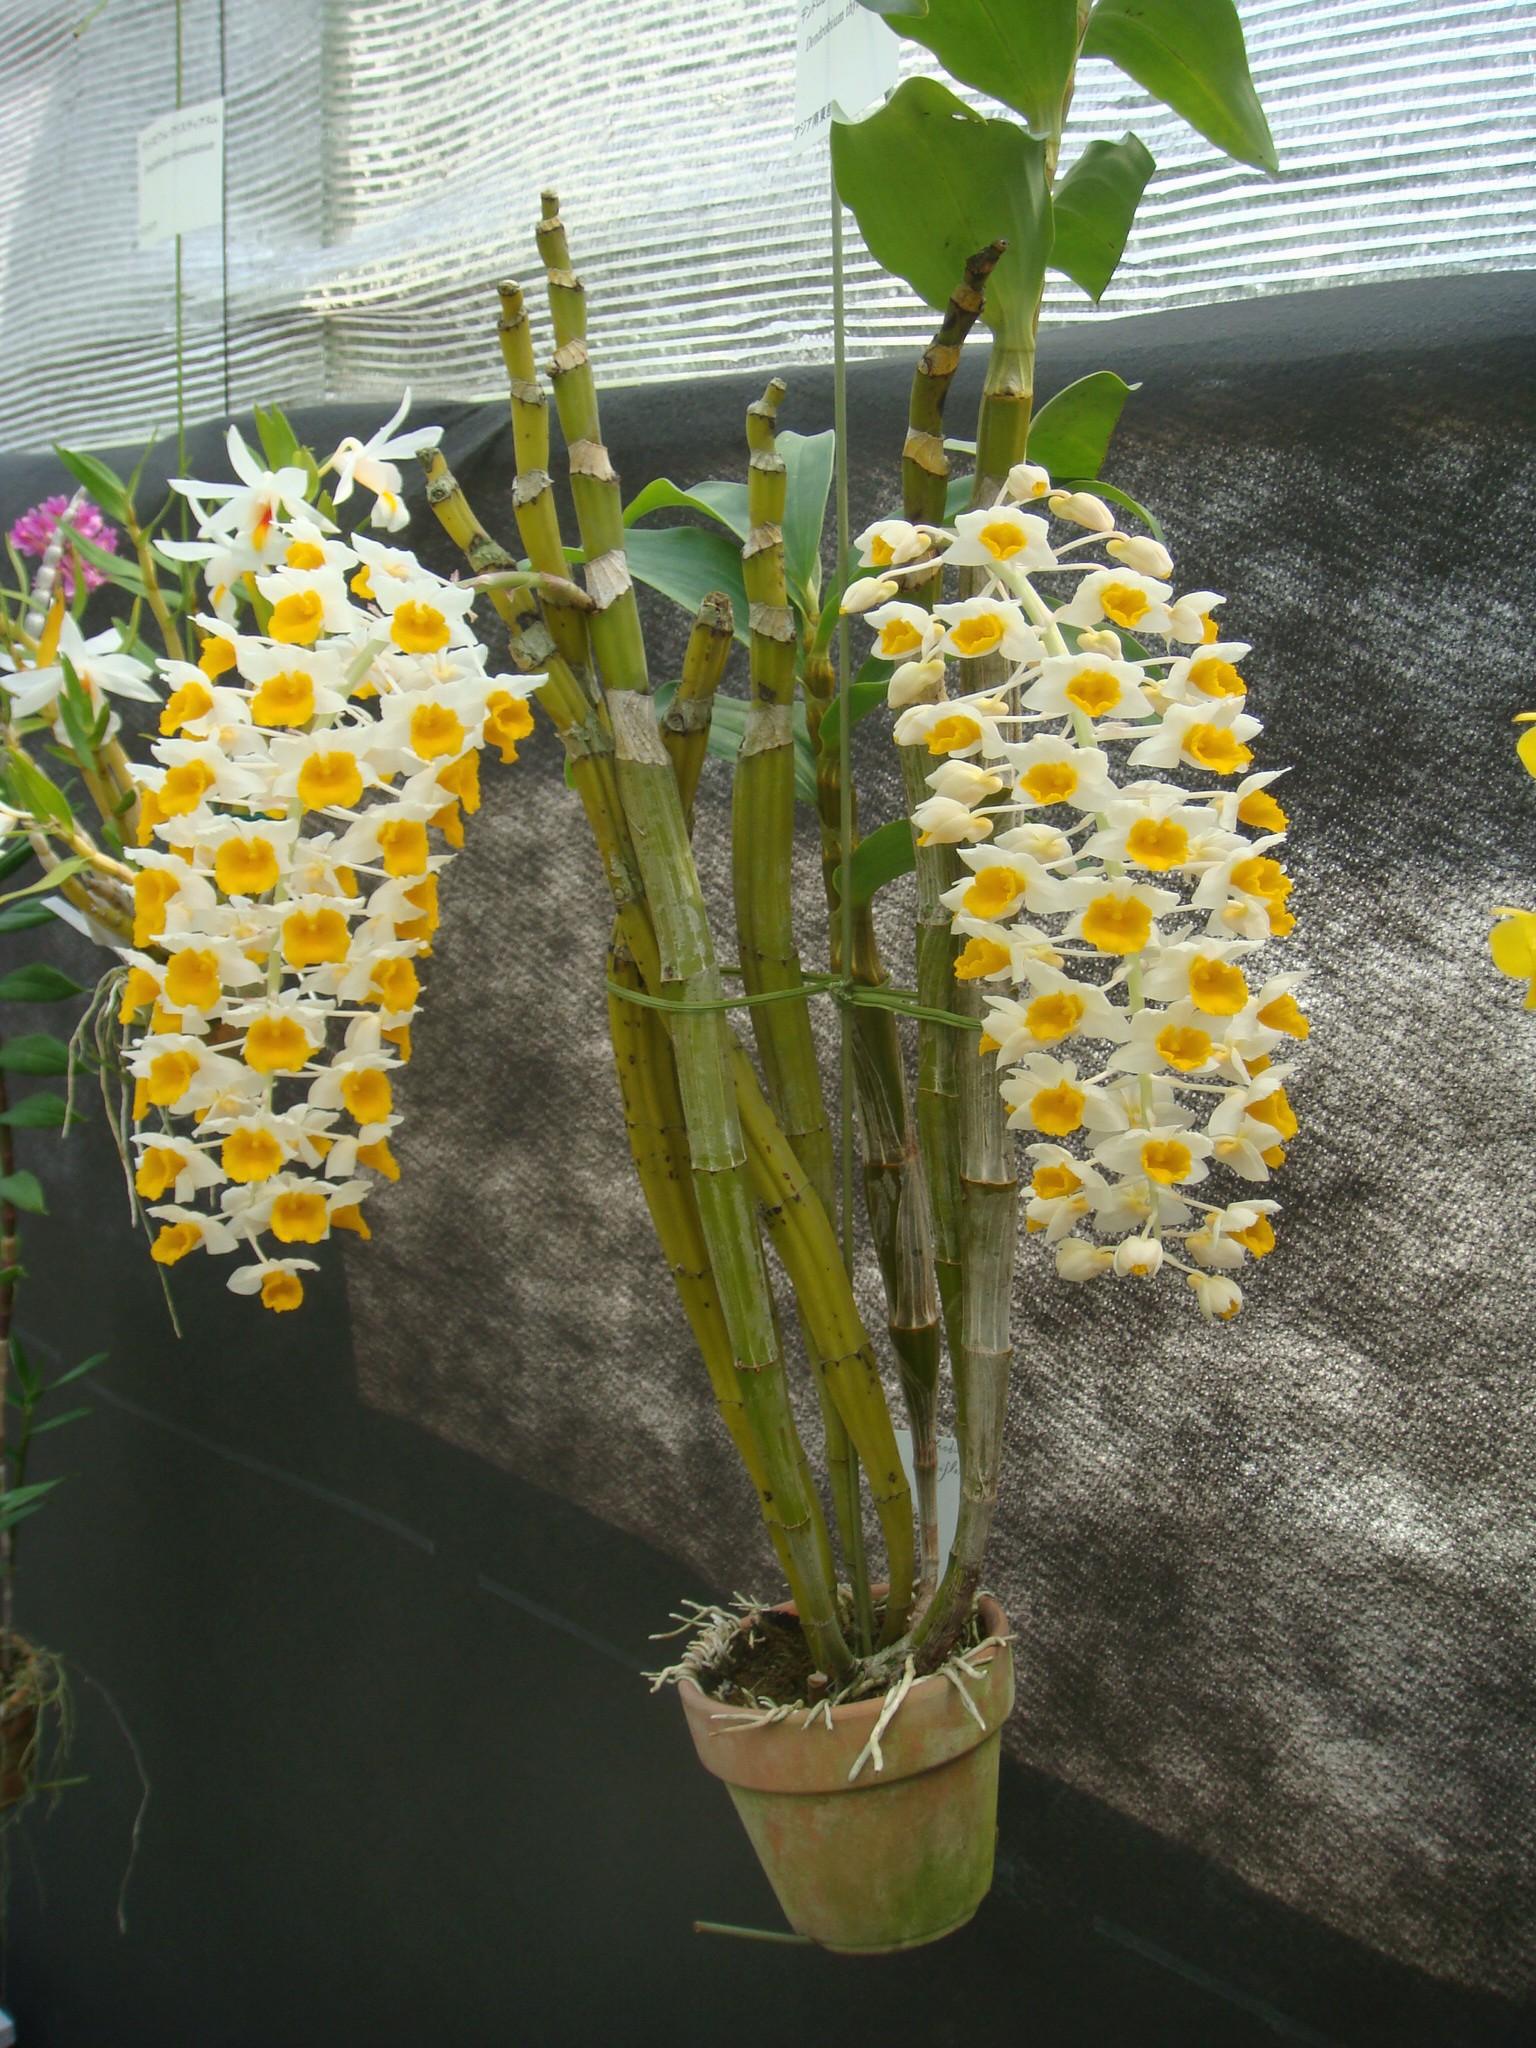 http://orchids.la.coocan.jp/Dendrobium/Dendrobium%20thyrsiflorum/DSC05019.JPG